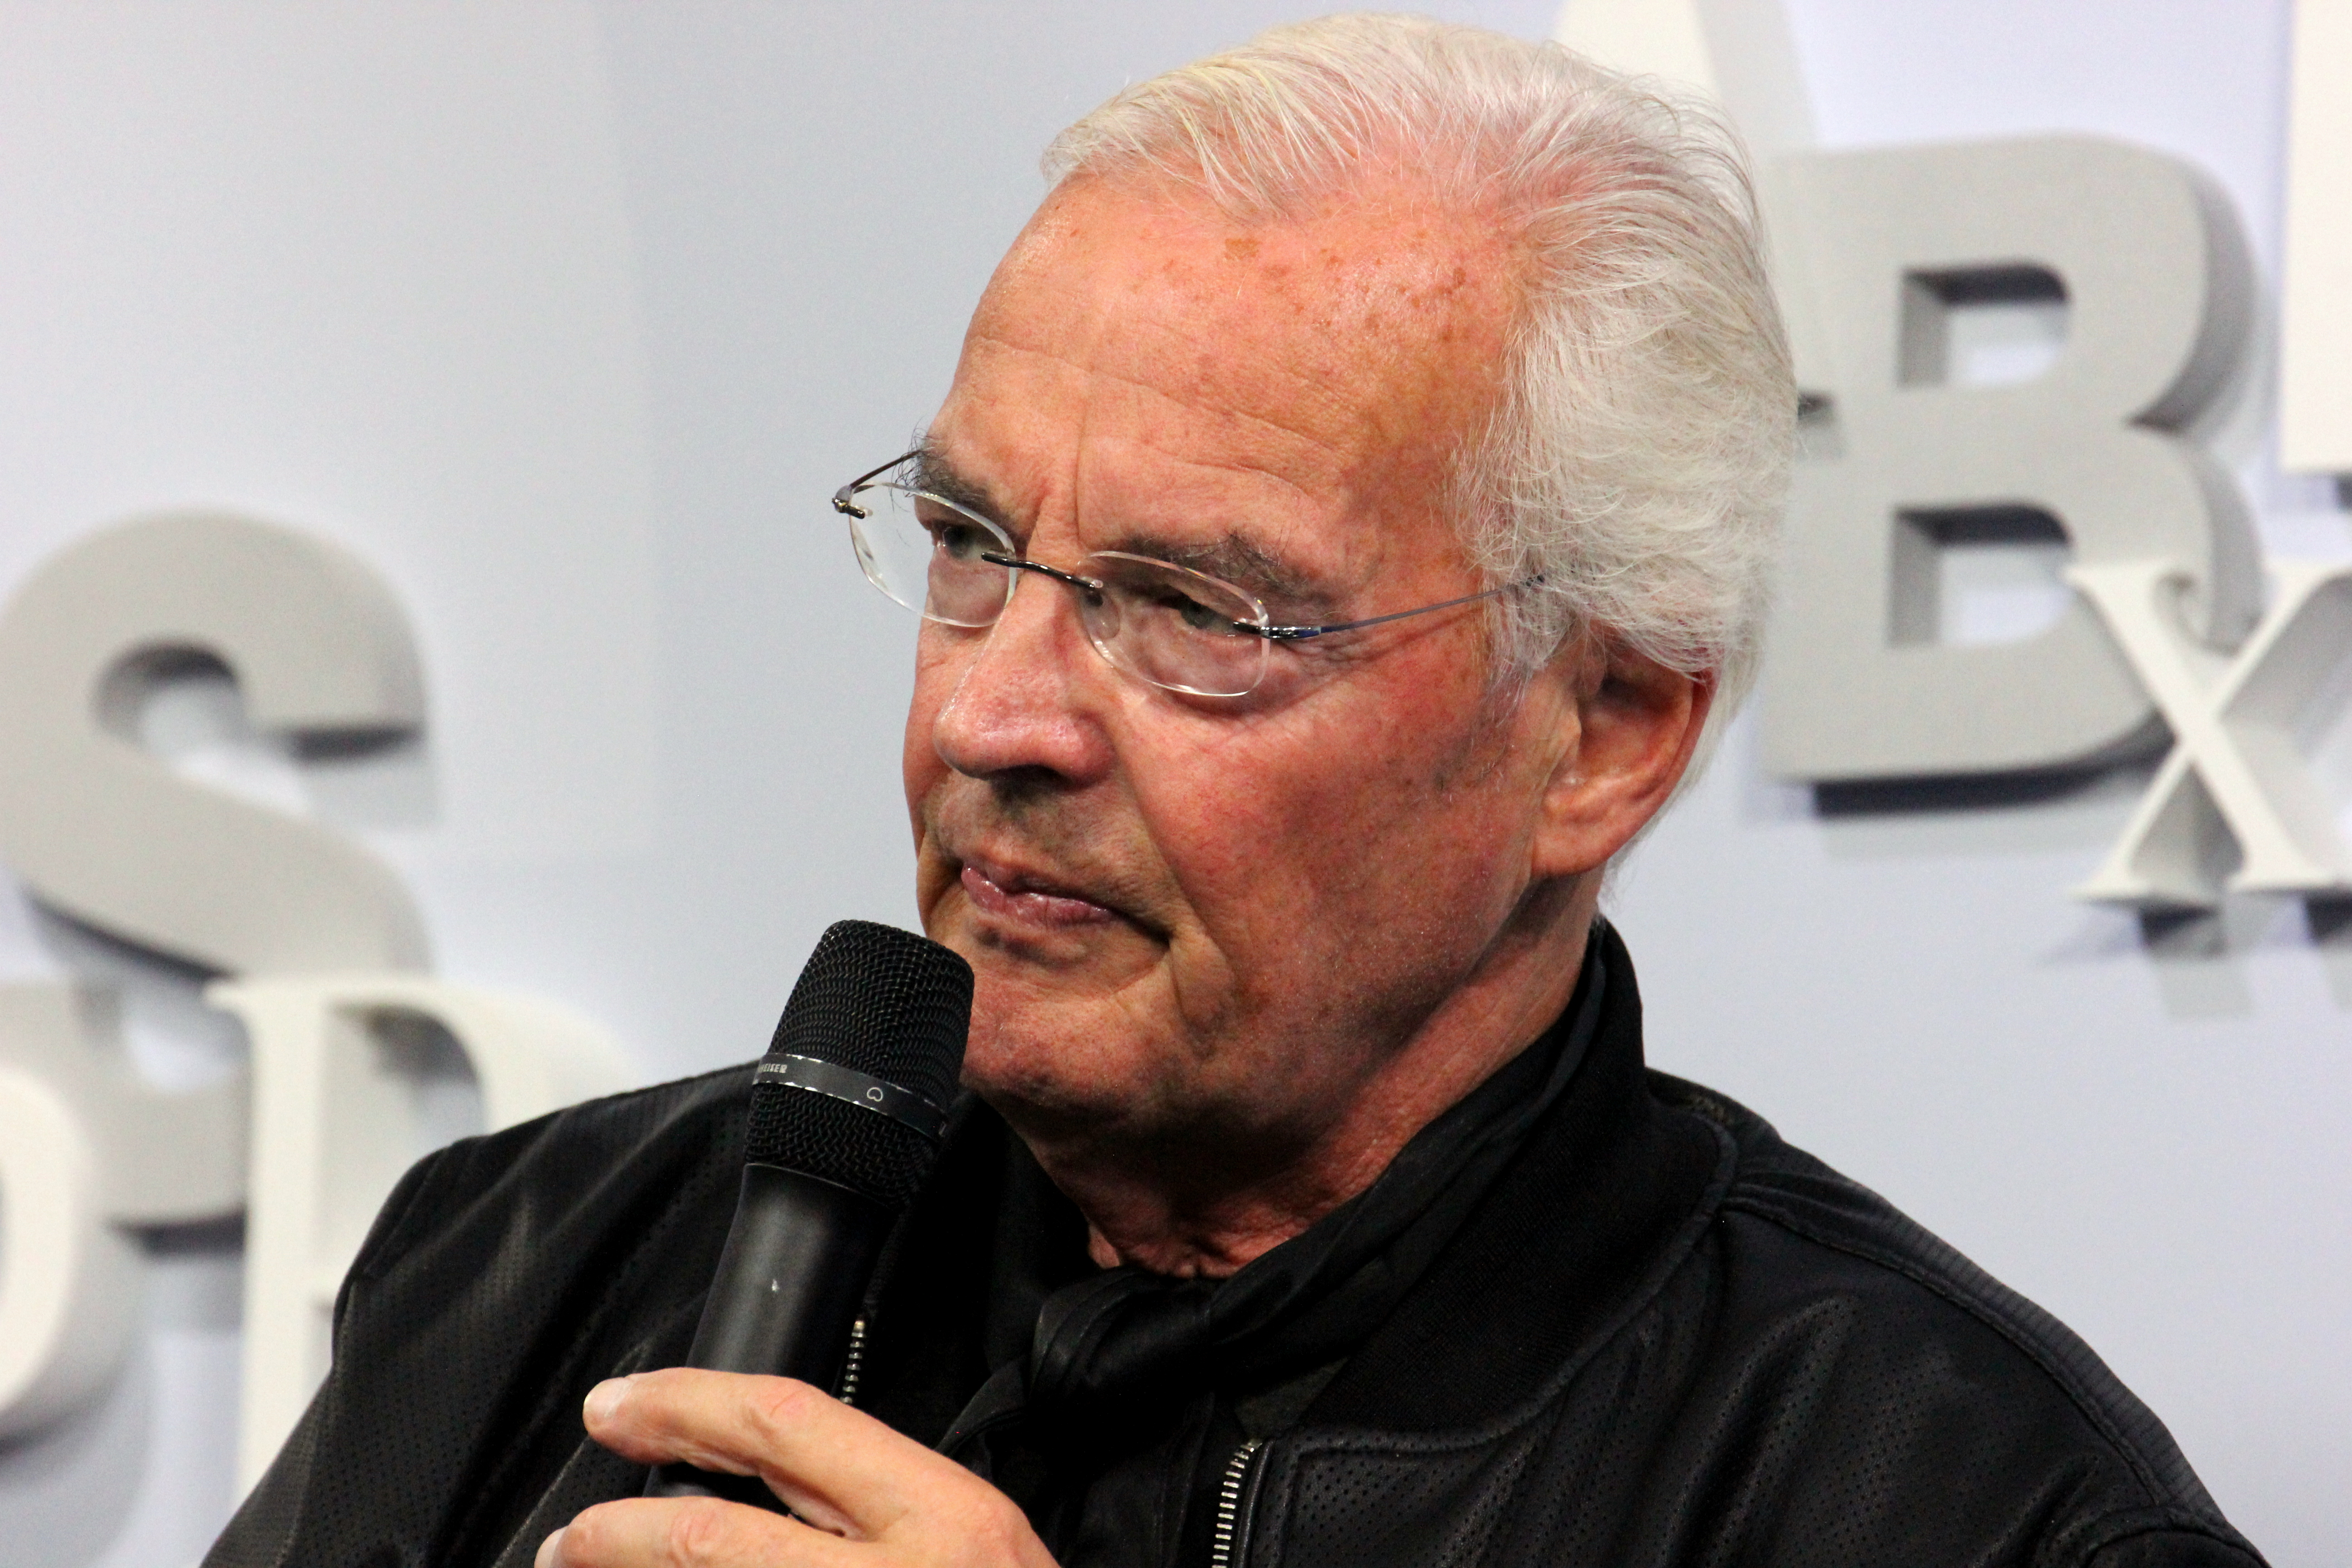 Bodo Kirchhoff auf der [[Frankfurter Buchmesse